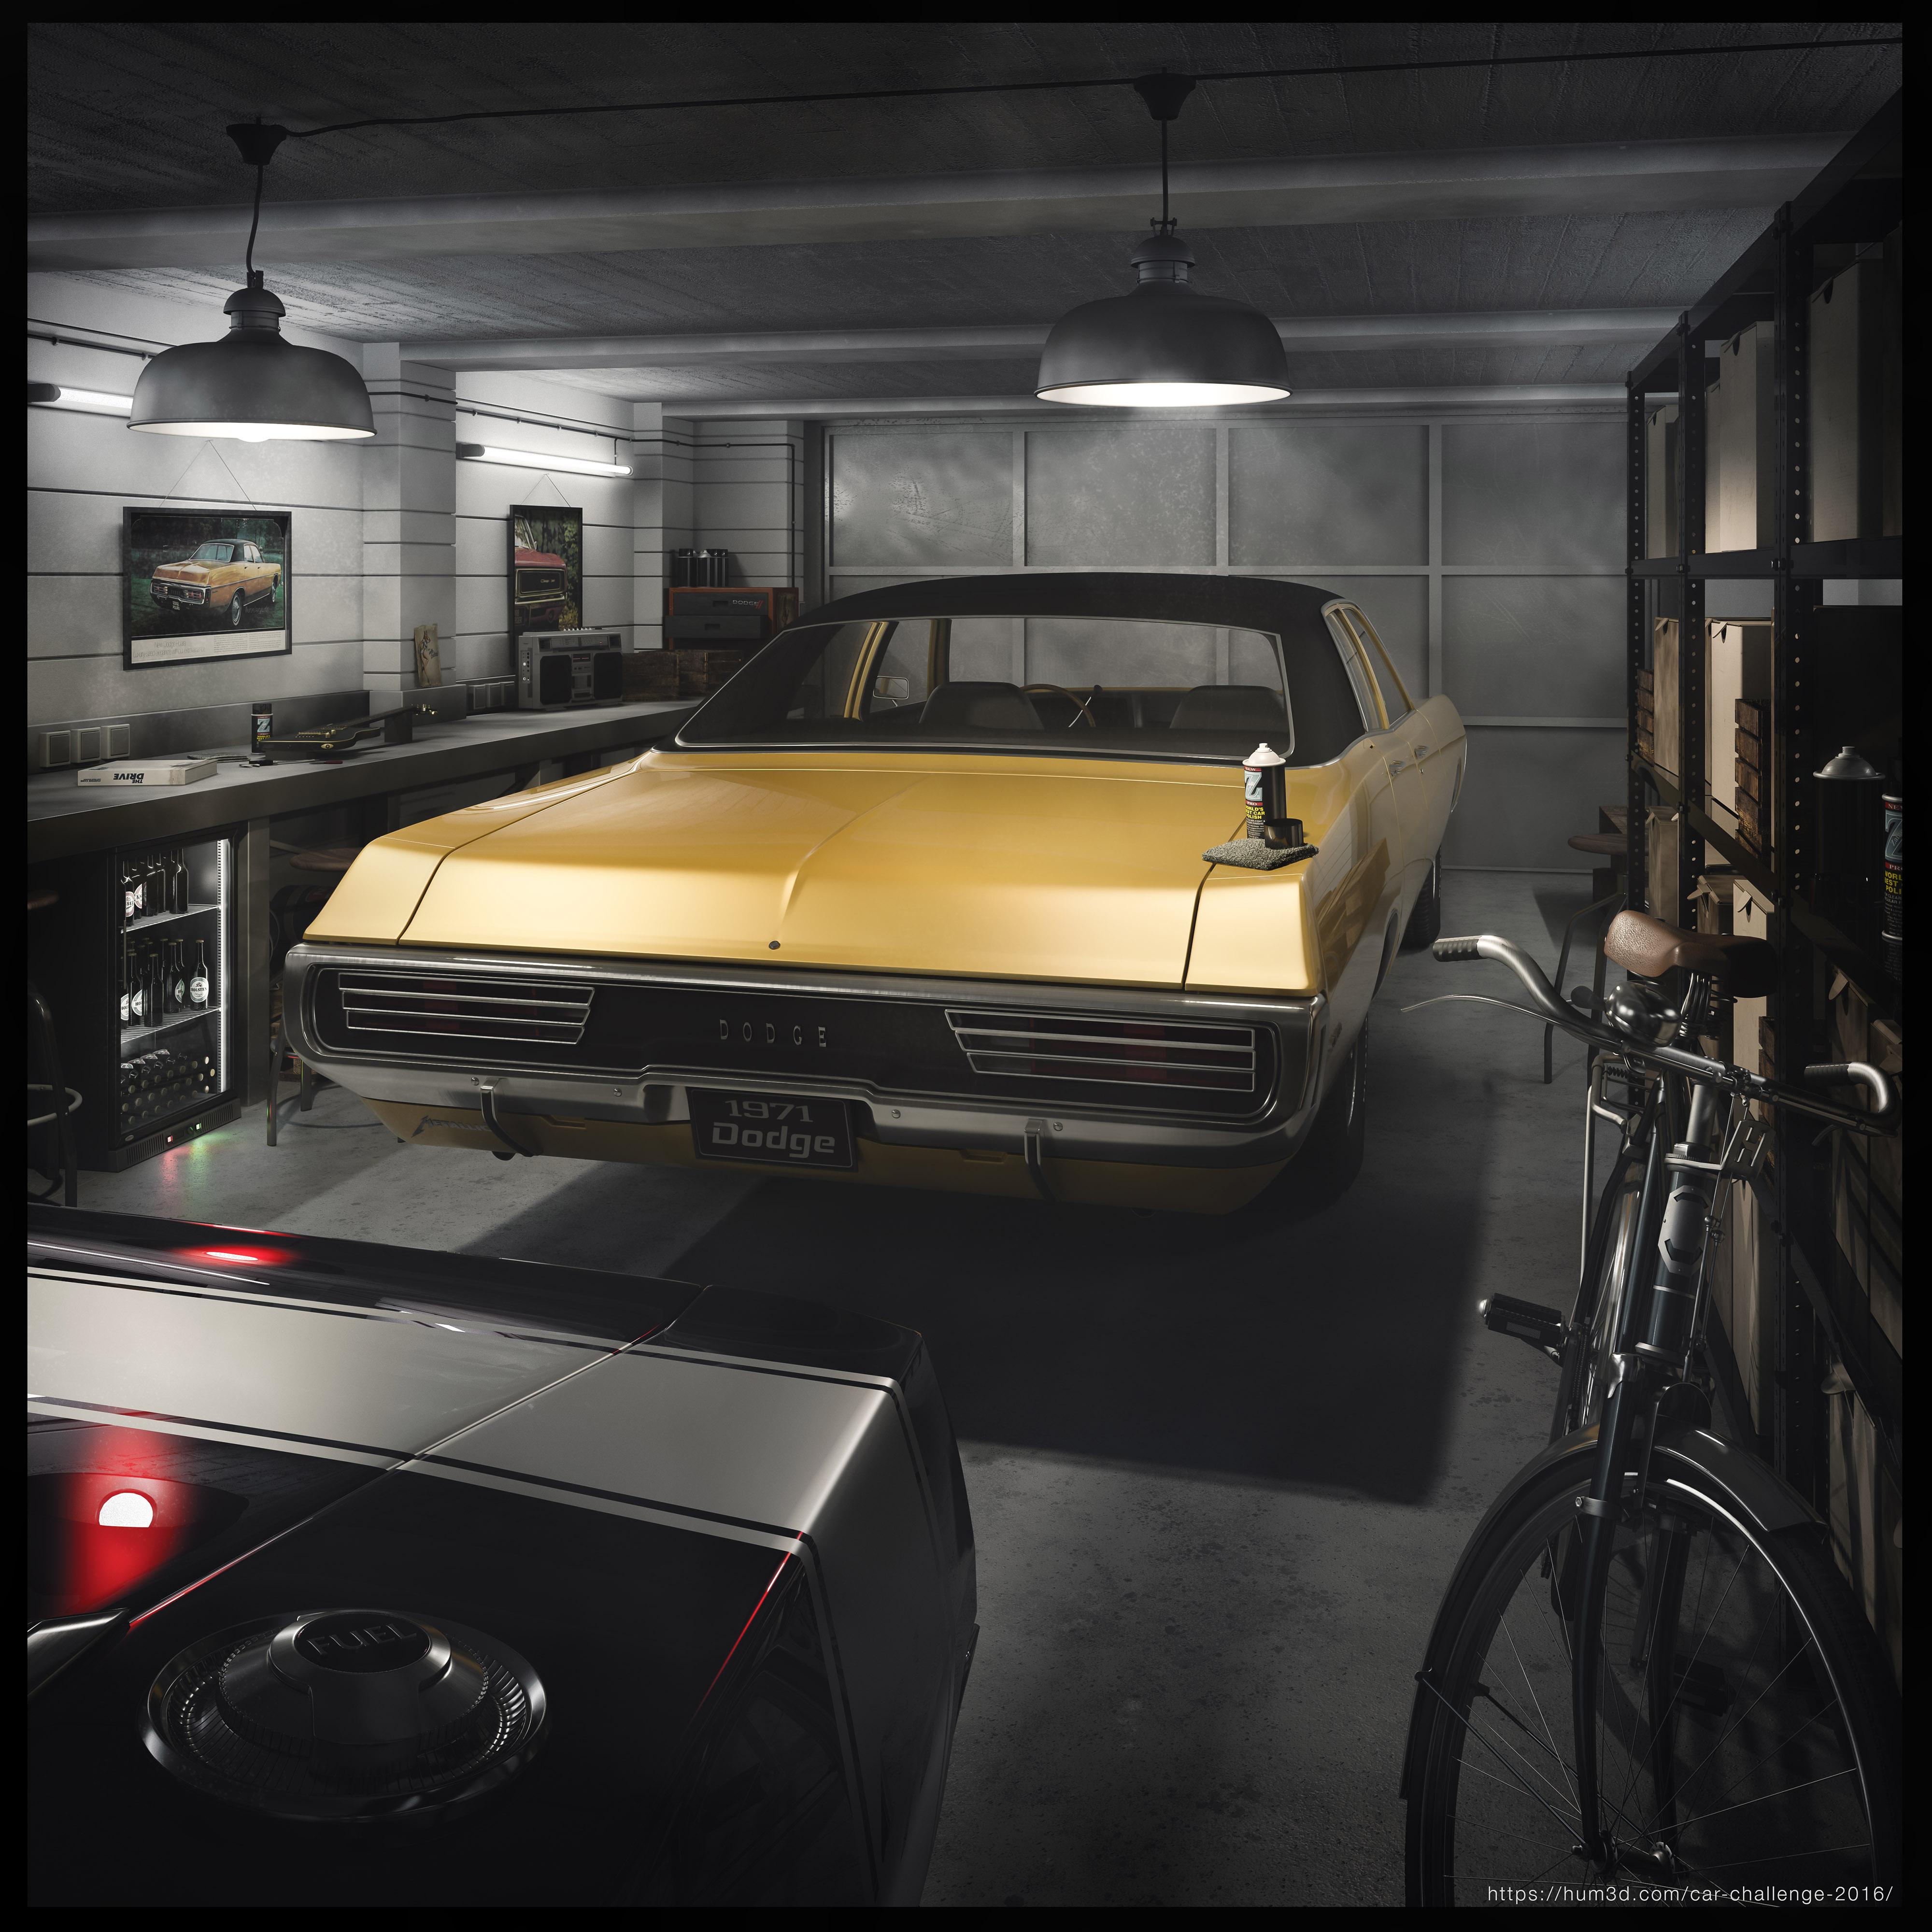 Dodge Garage 3d art